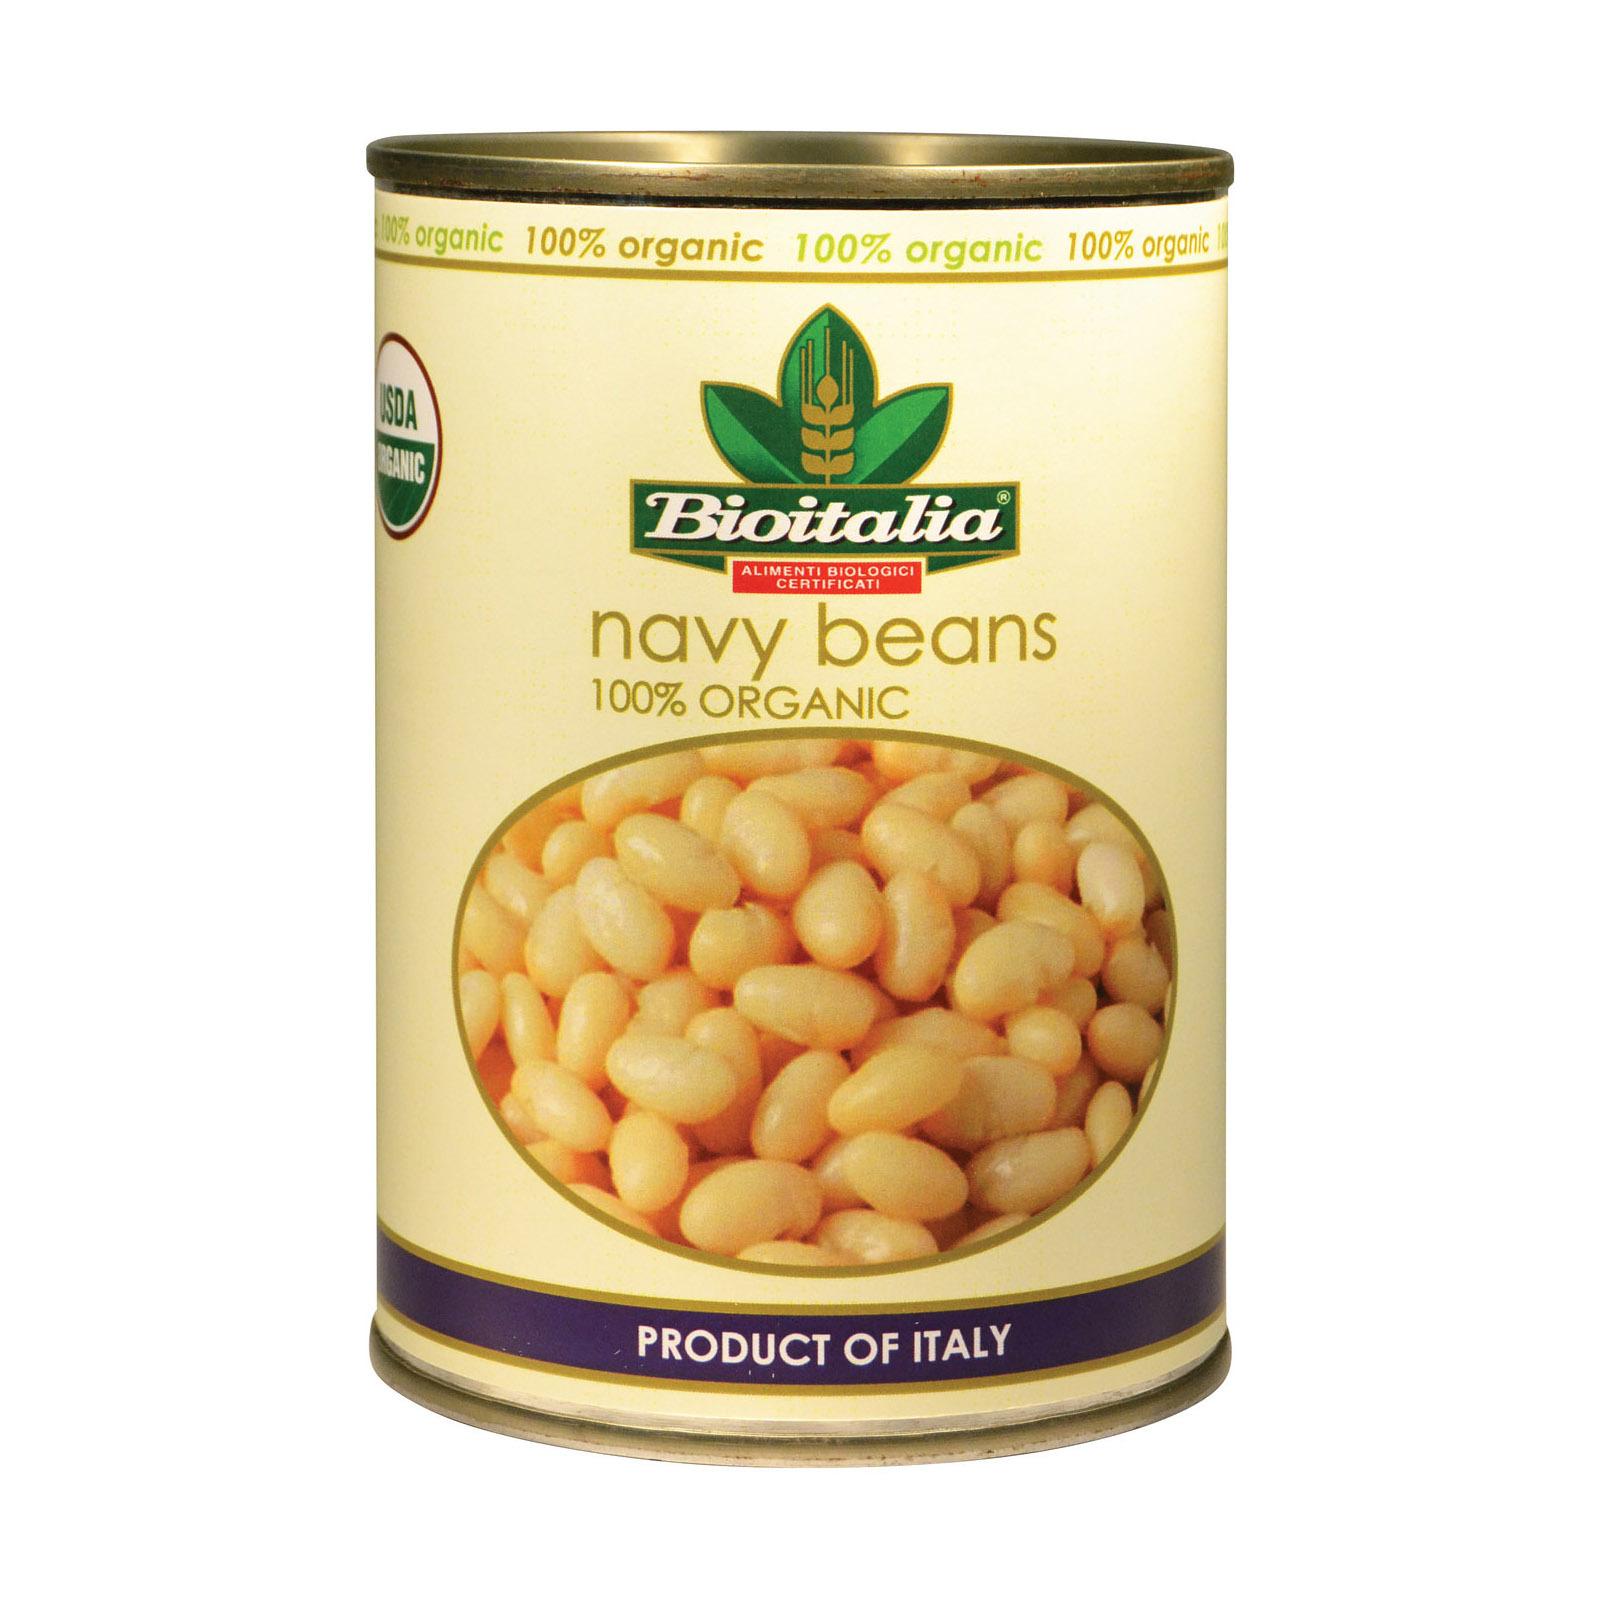 Bioitalia Beans - Navy Beans - Case of 12 - 14 oz.